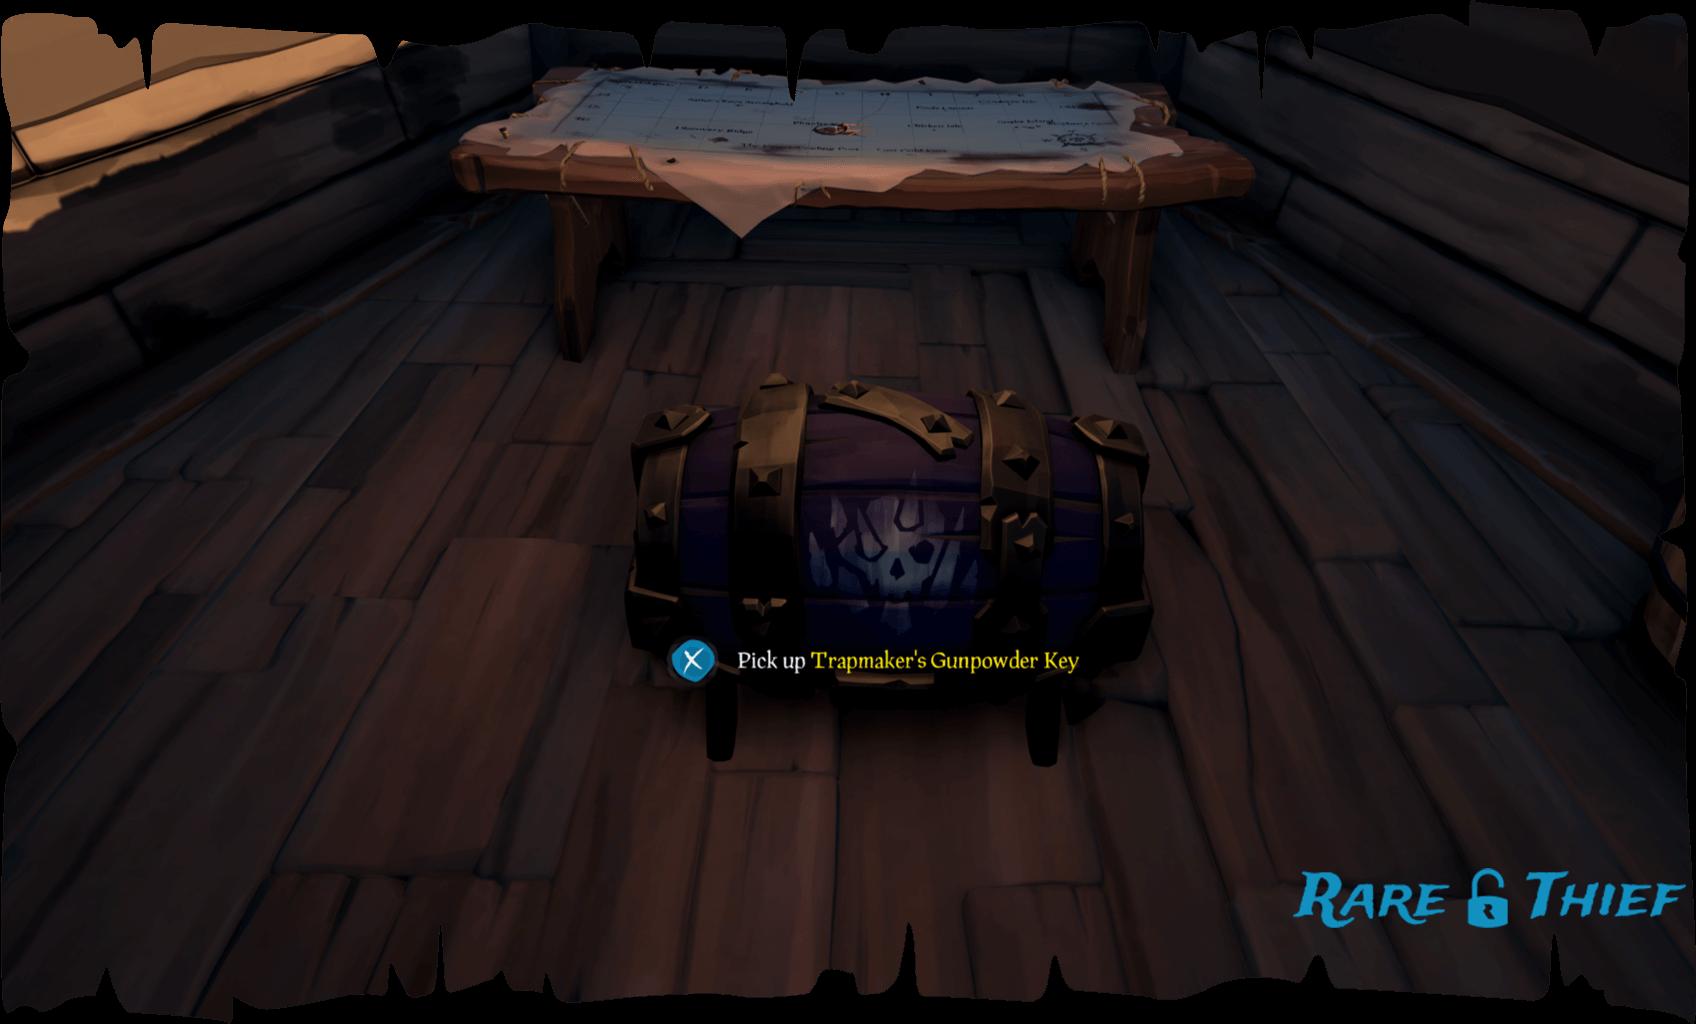 Trapmaker's Gunpowder Key